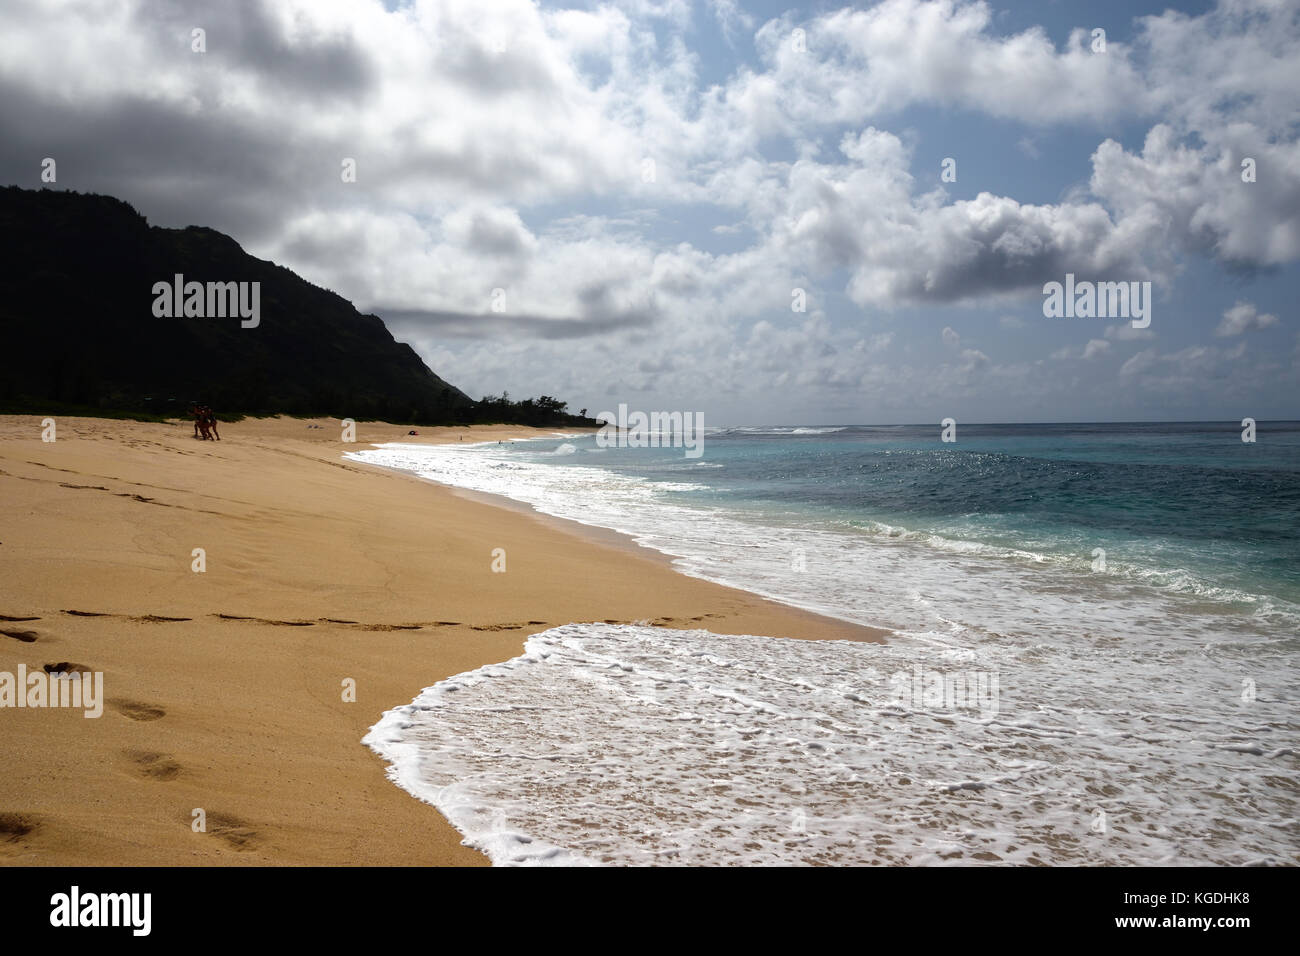 Mokuleia beach - Oahu, Hawaii - Stock Image